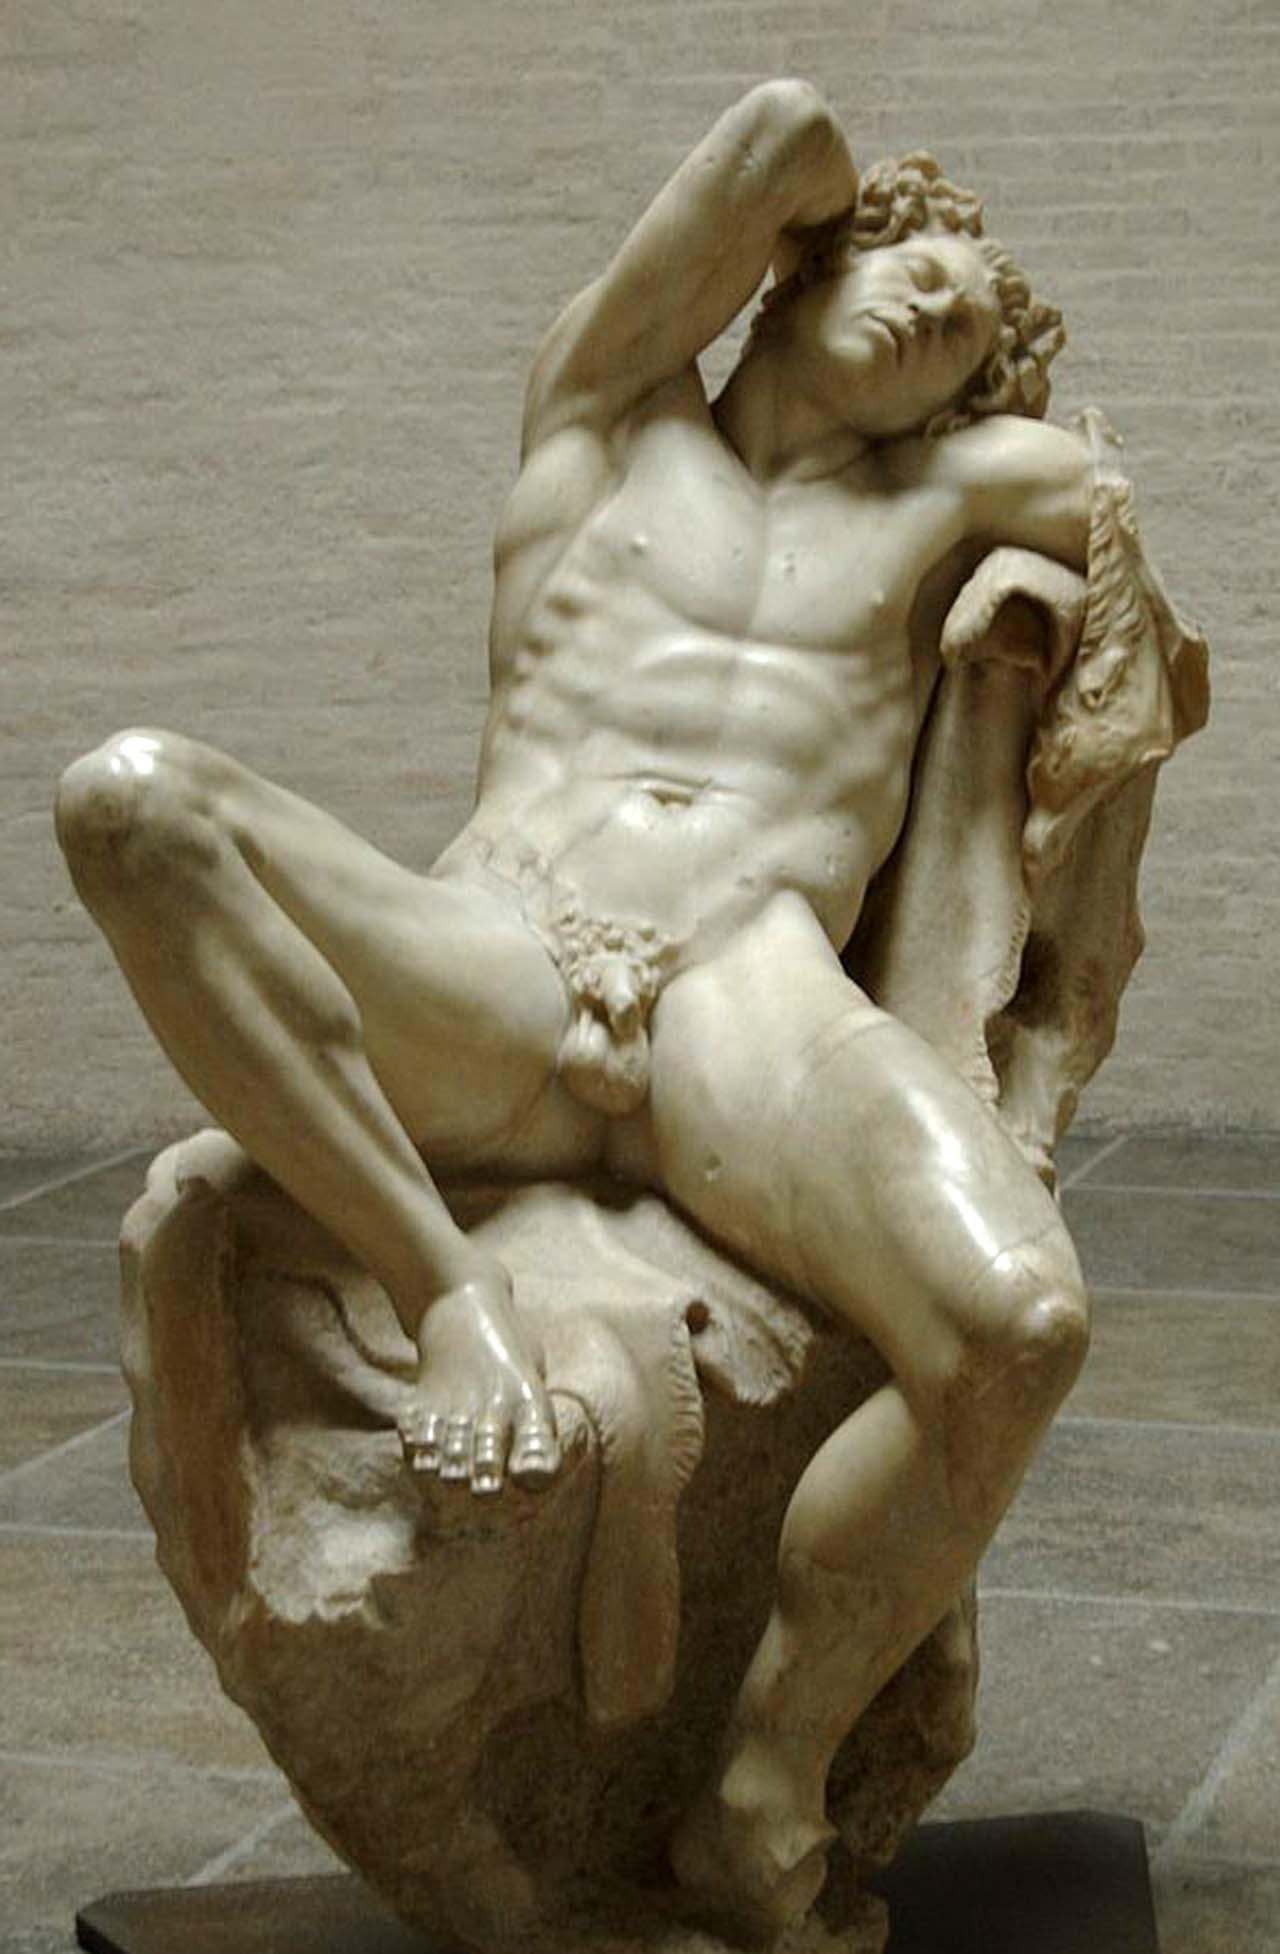 """Barberini Faun"" from the Glyptothek, Munich (photo from Wikipedia)"